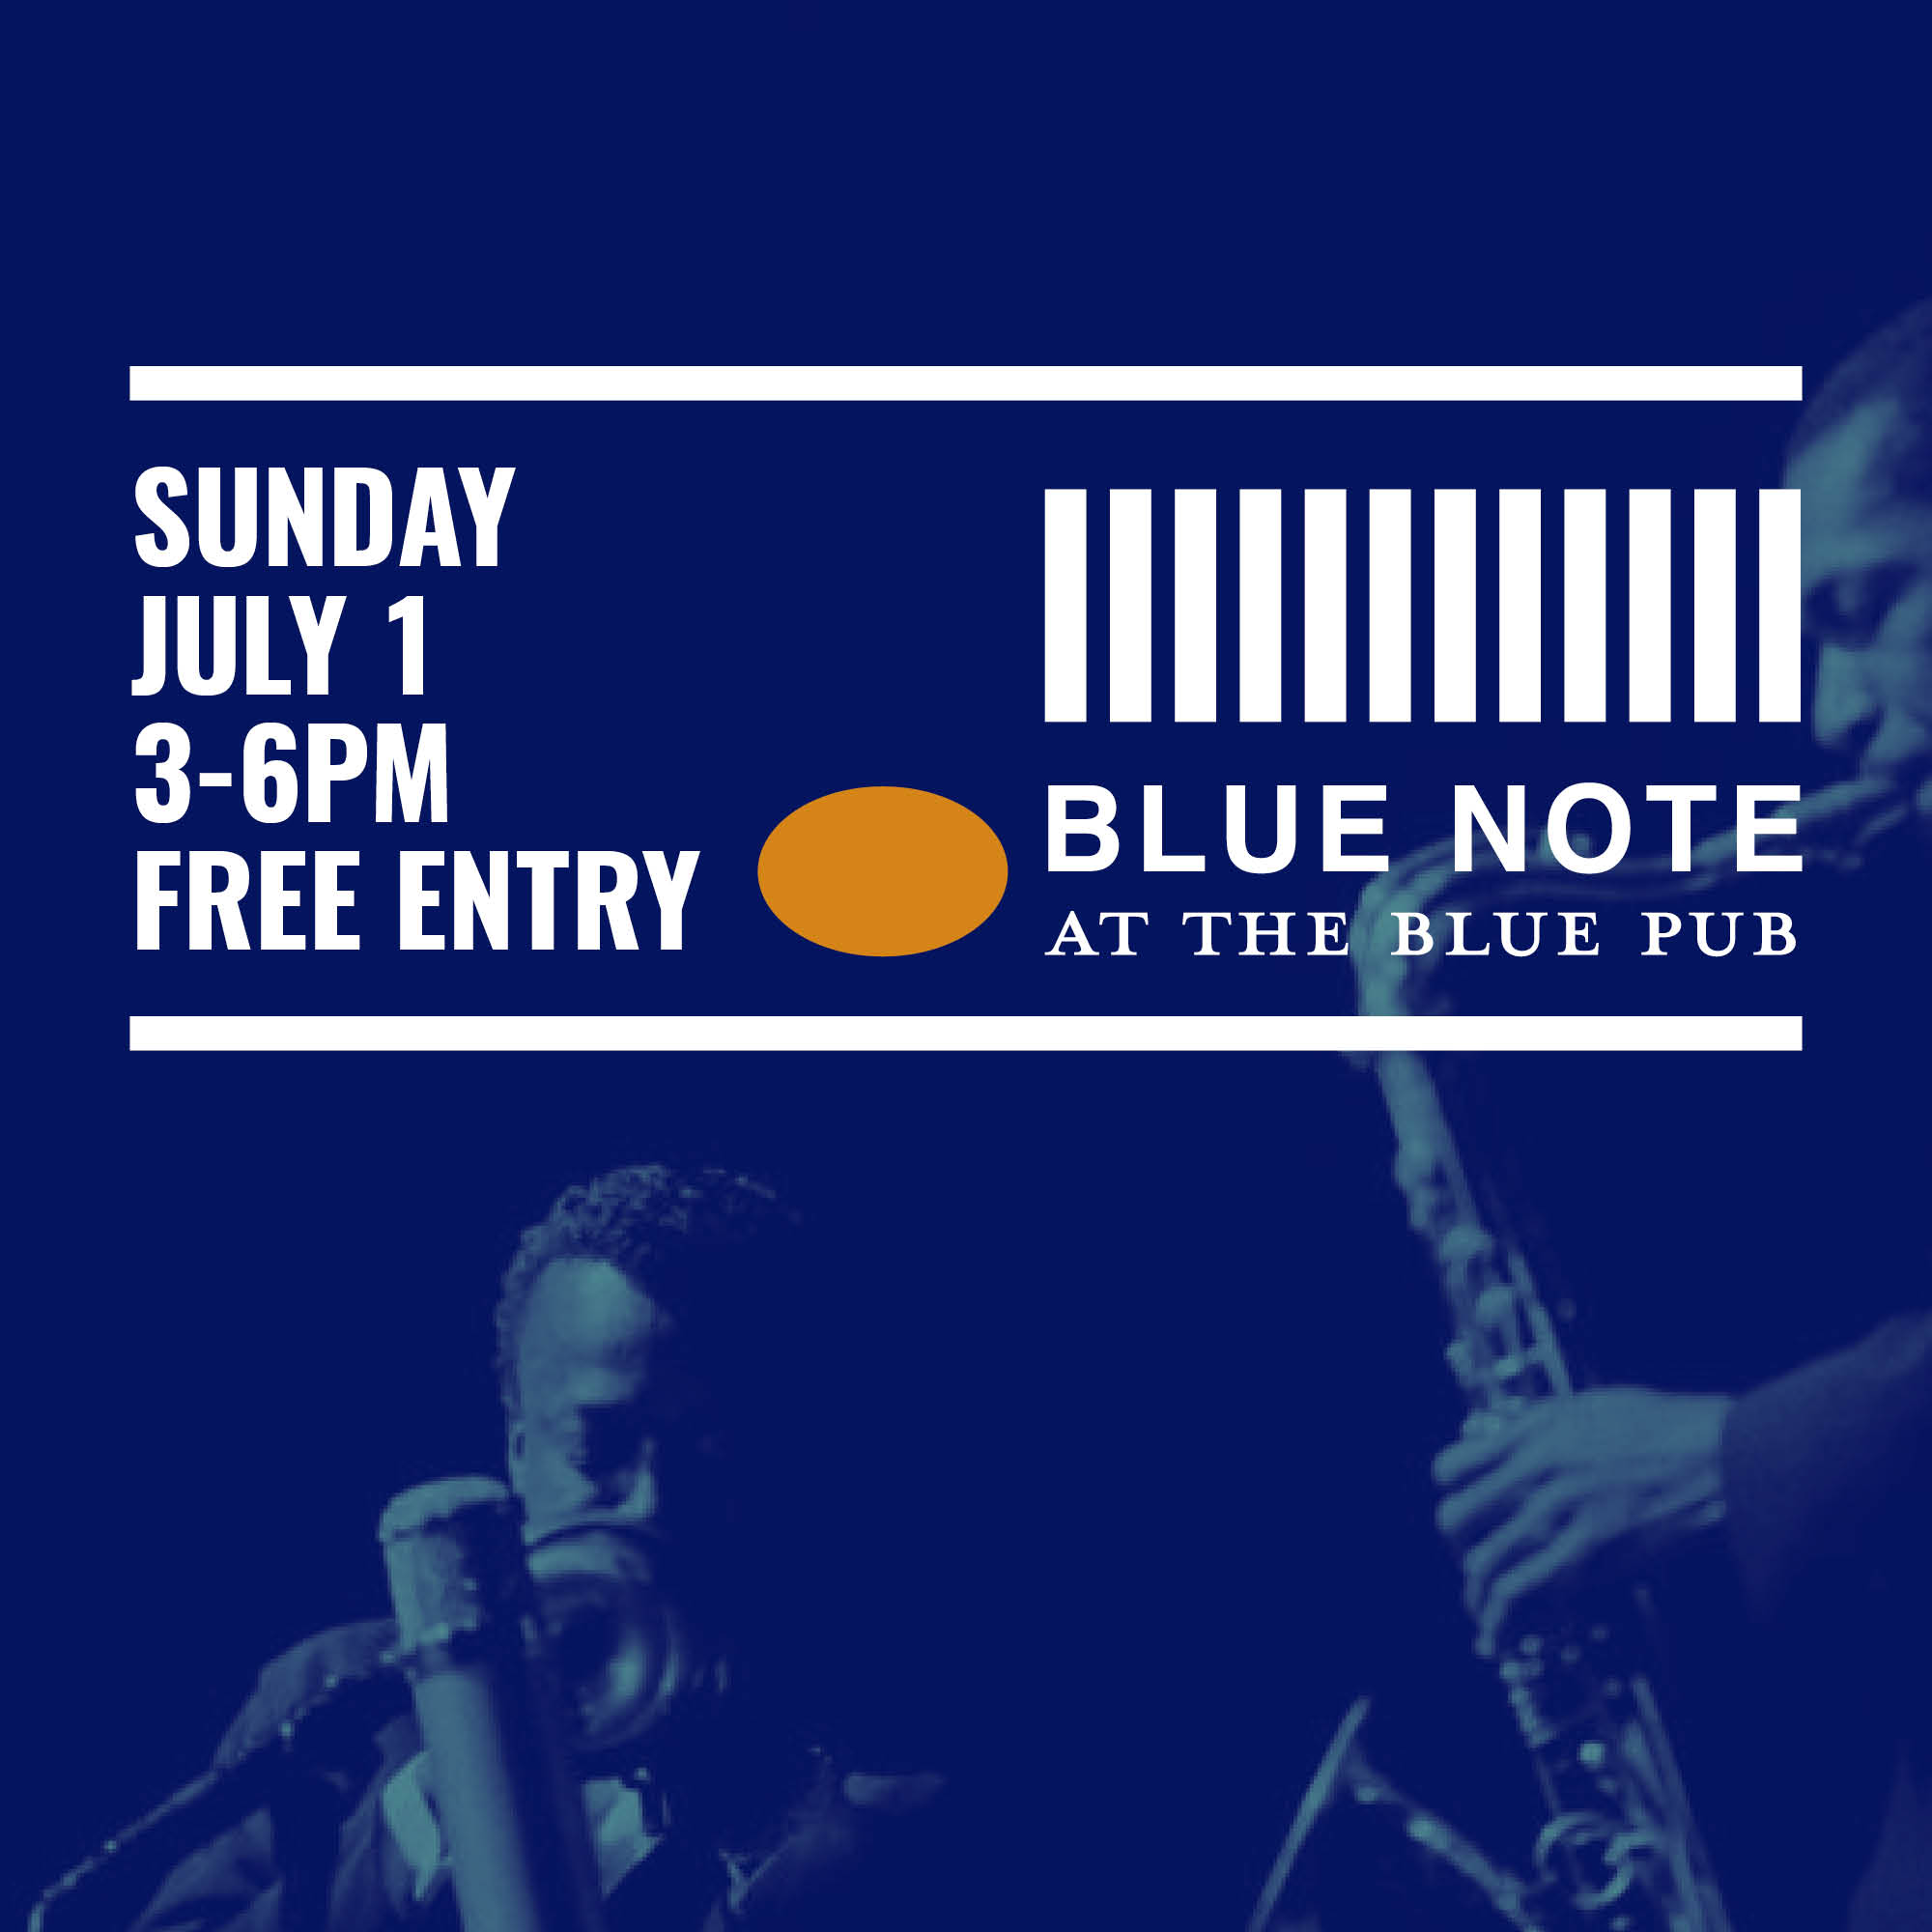 Facebook_July Blue Note4.jpg